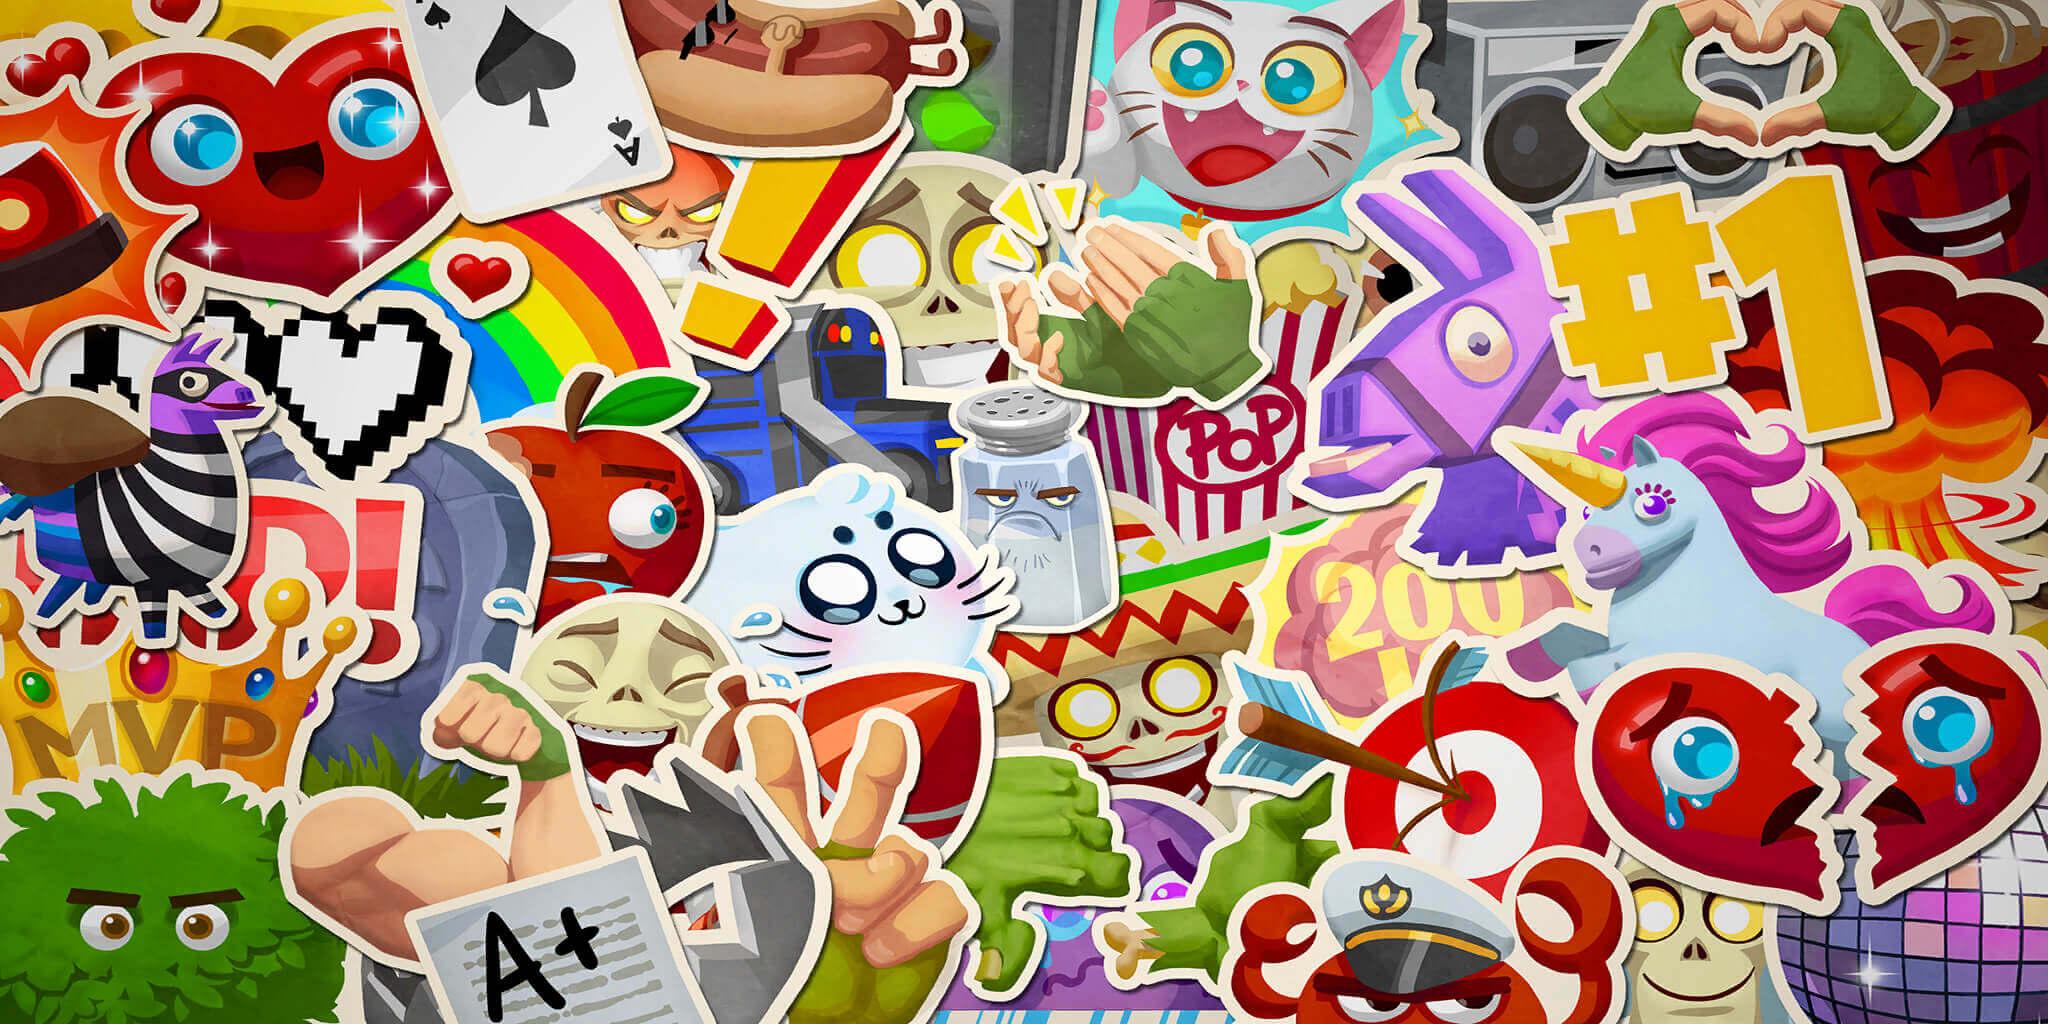 fortnite wallpaper emoticons - fortnite emoji wallpaper